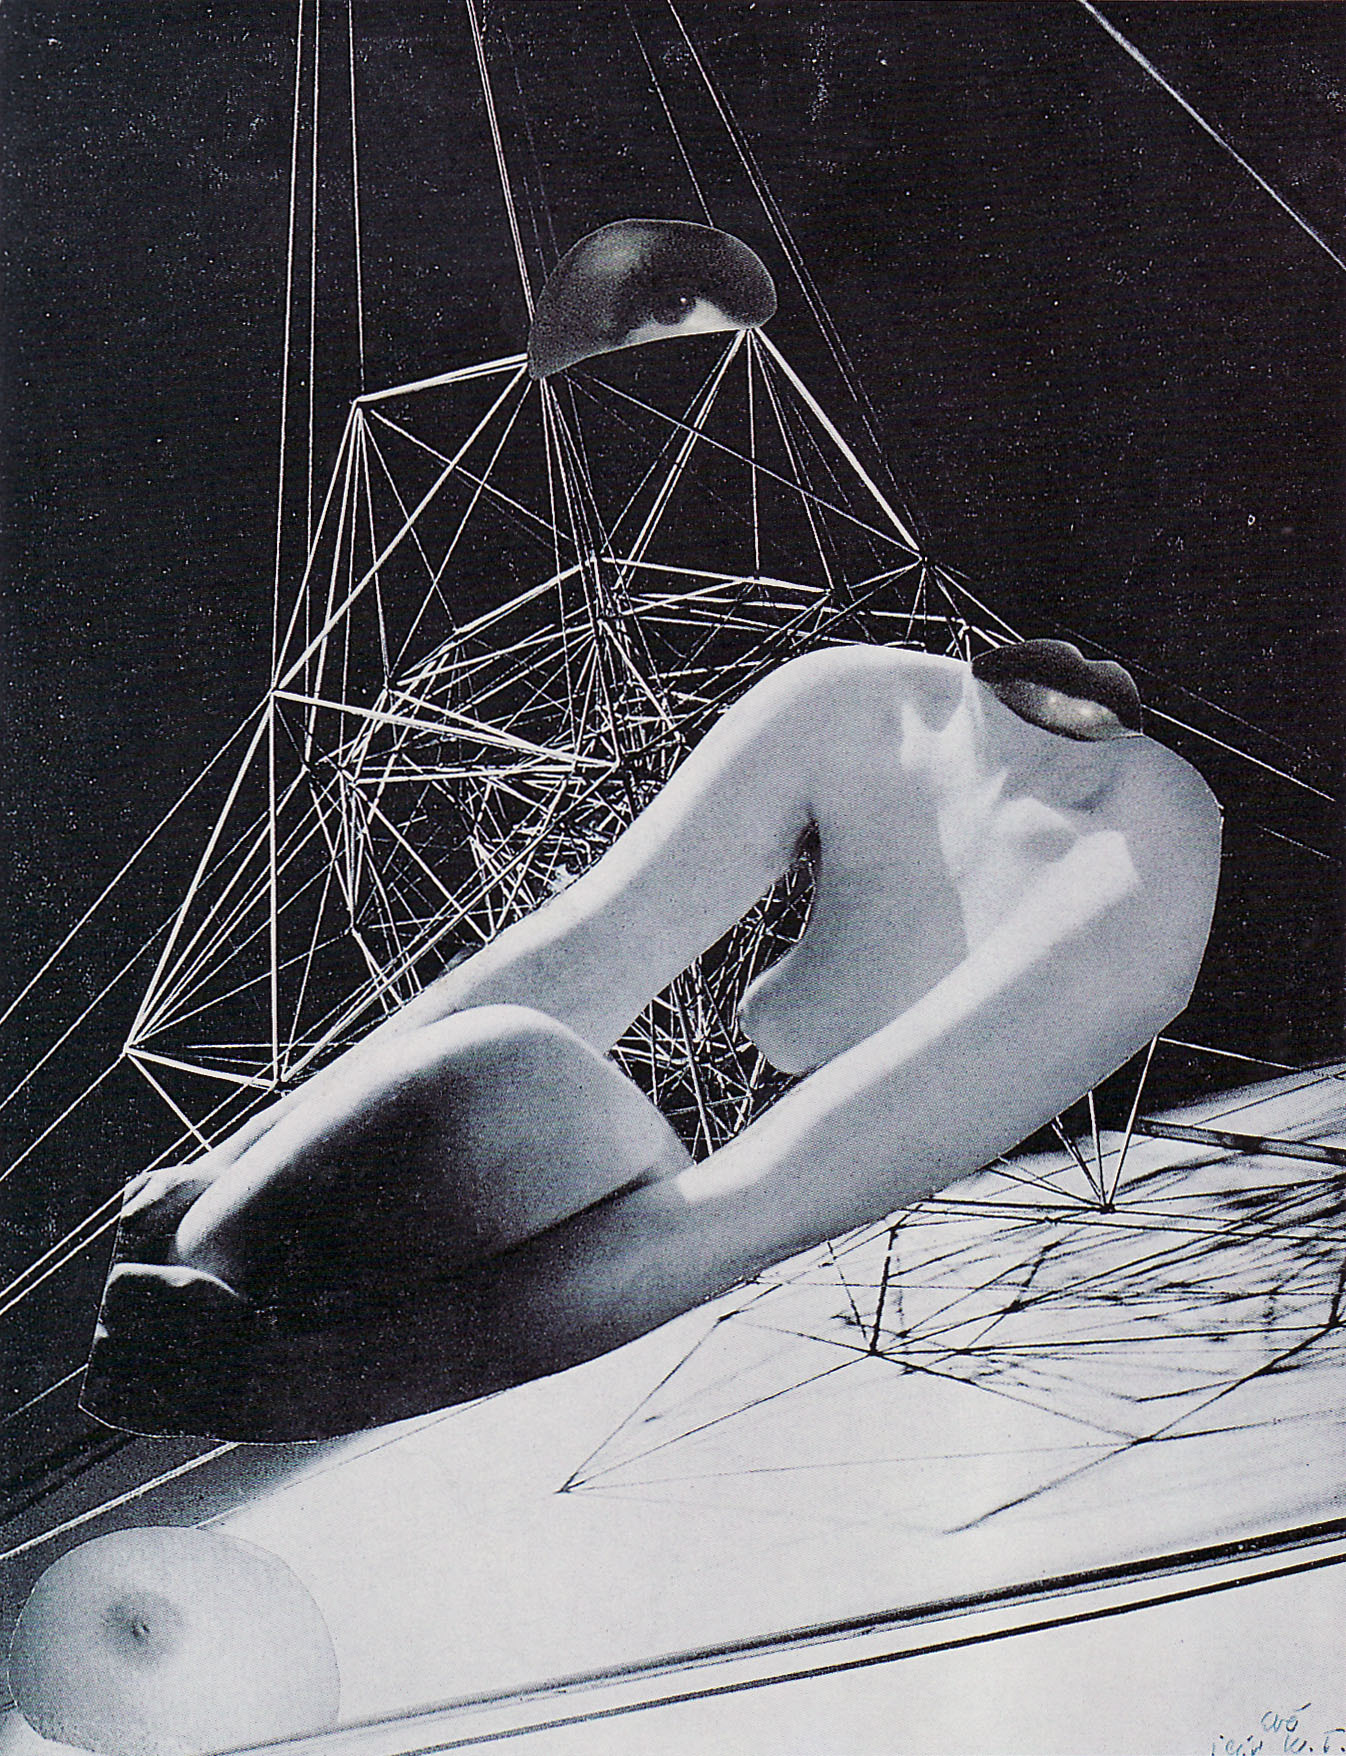 Karel Teige,- Collage# 299, 1944. (c) Nachlass Karel Teige